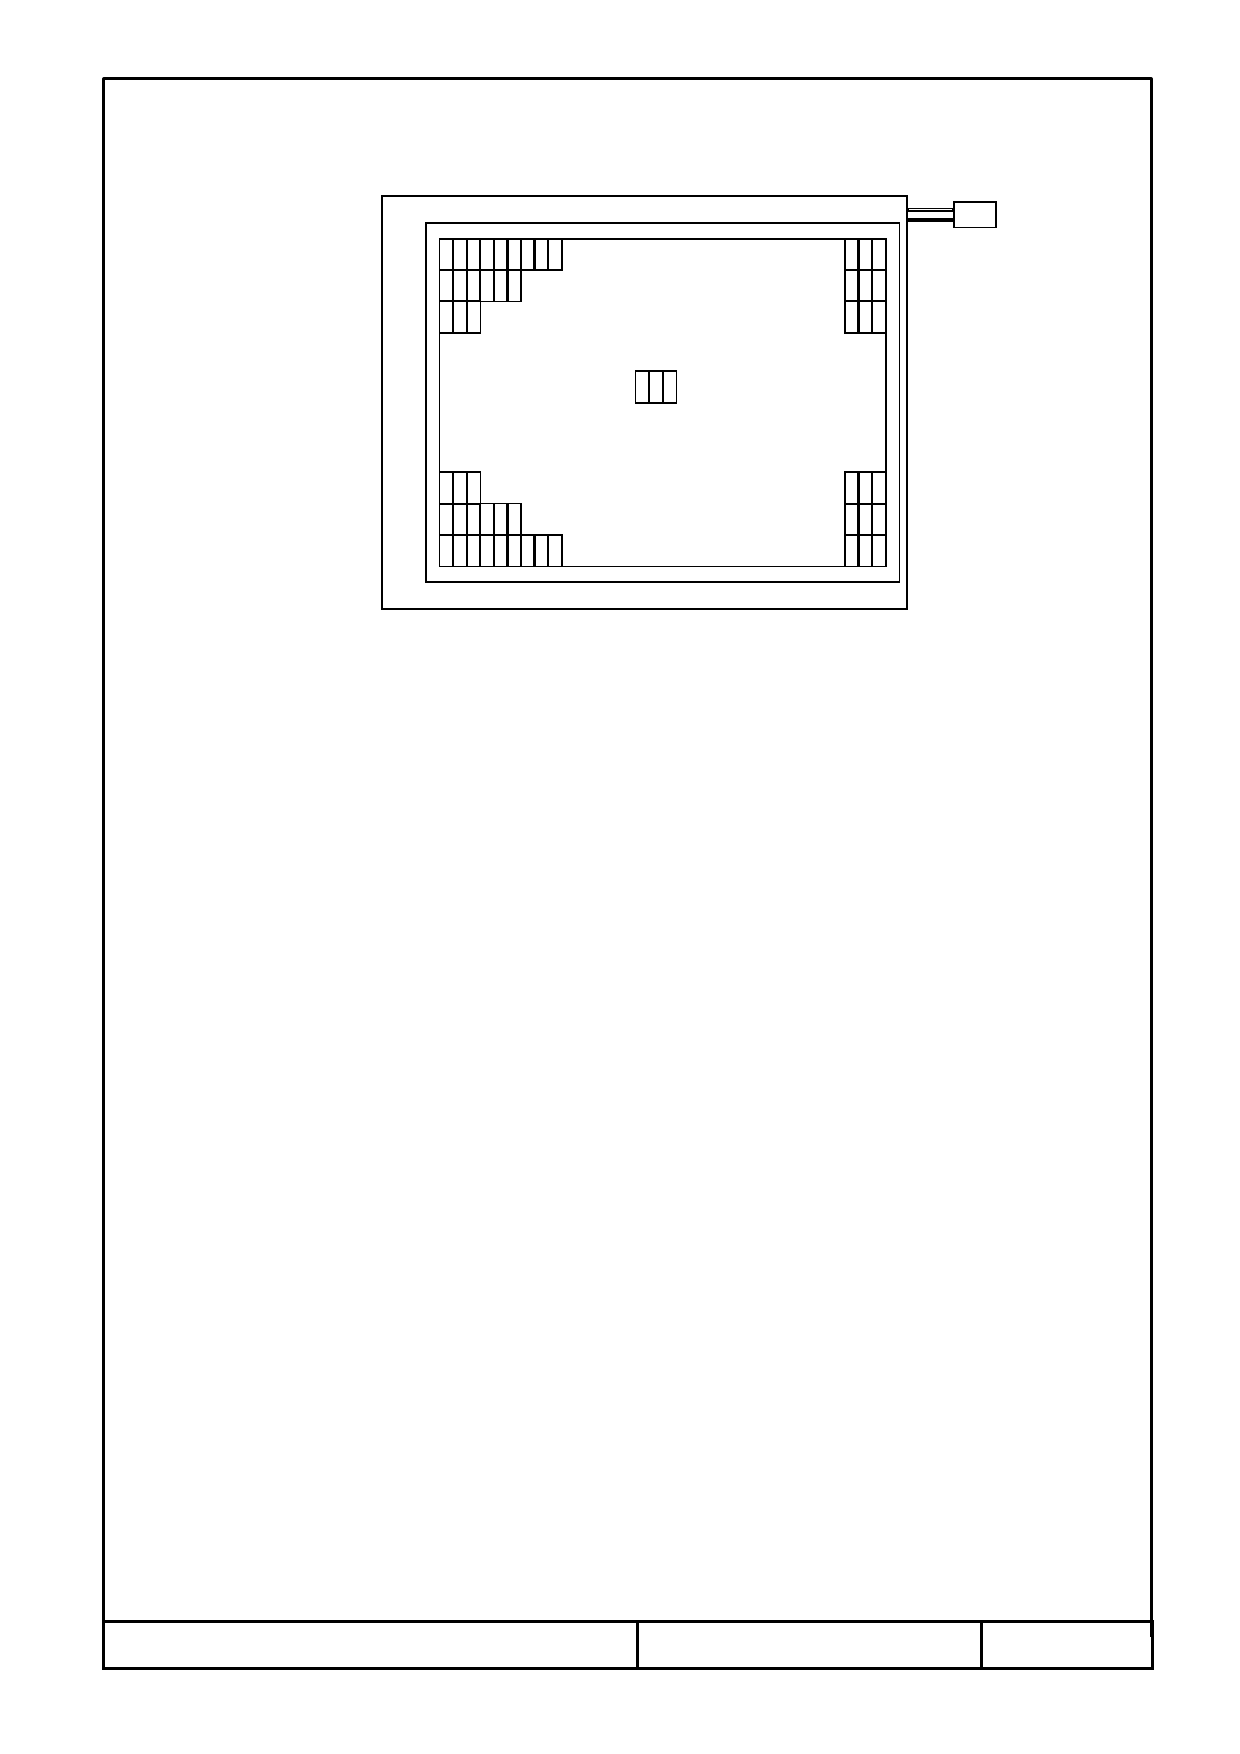 T-51410D104_FW_R_AA arduino